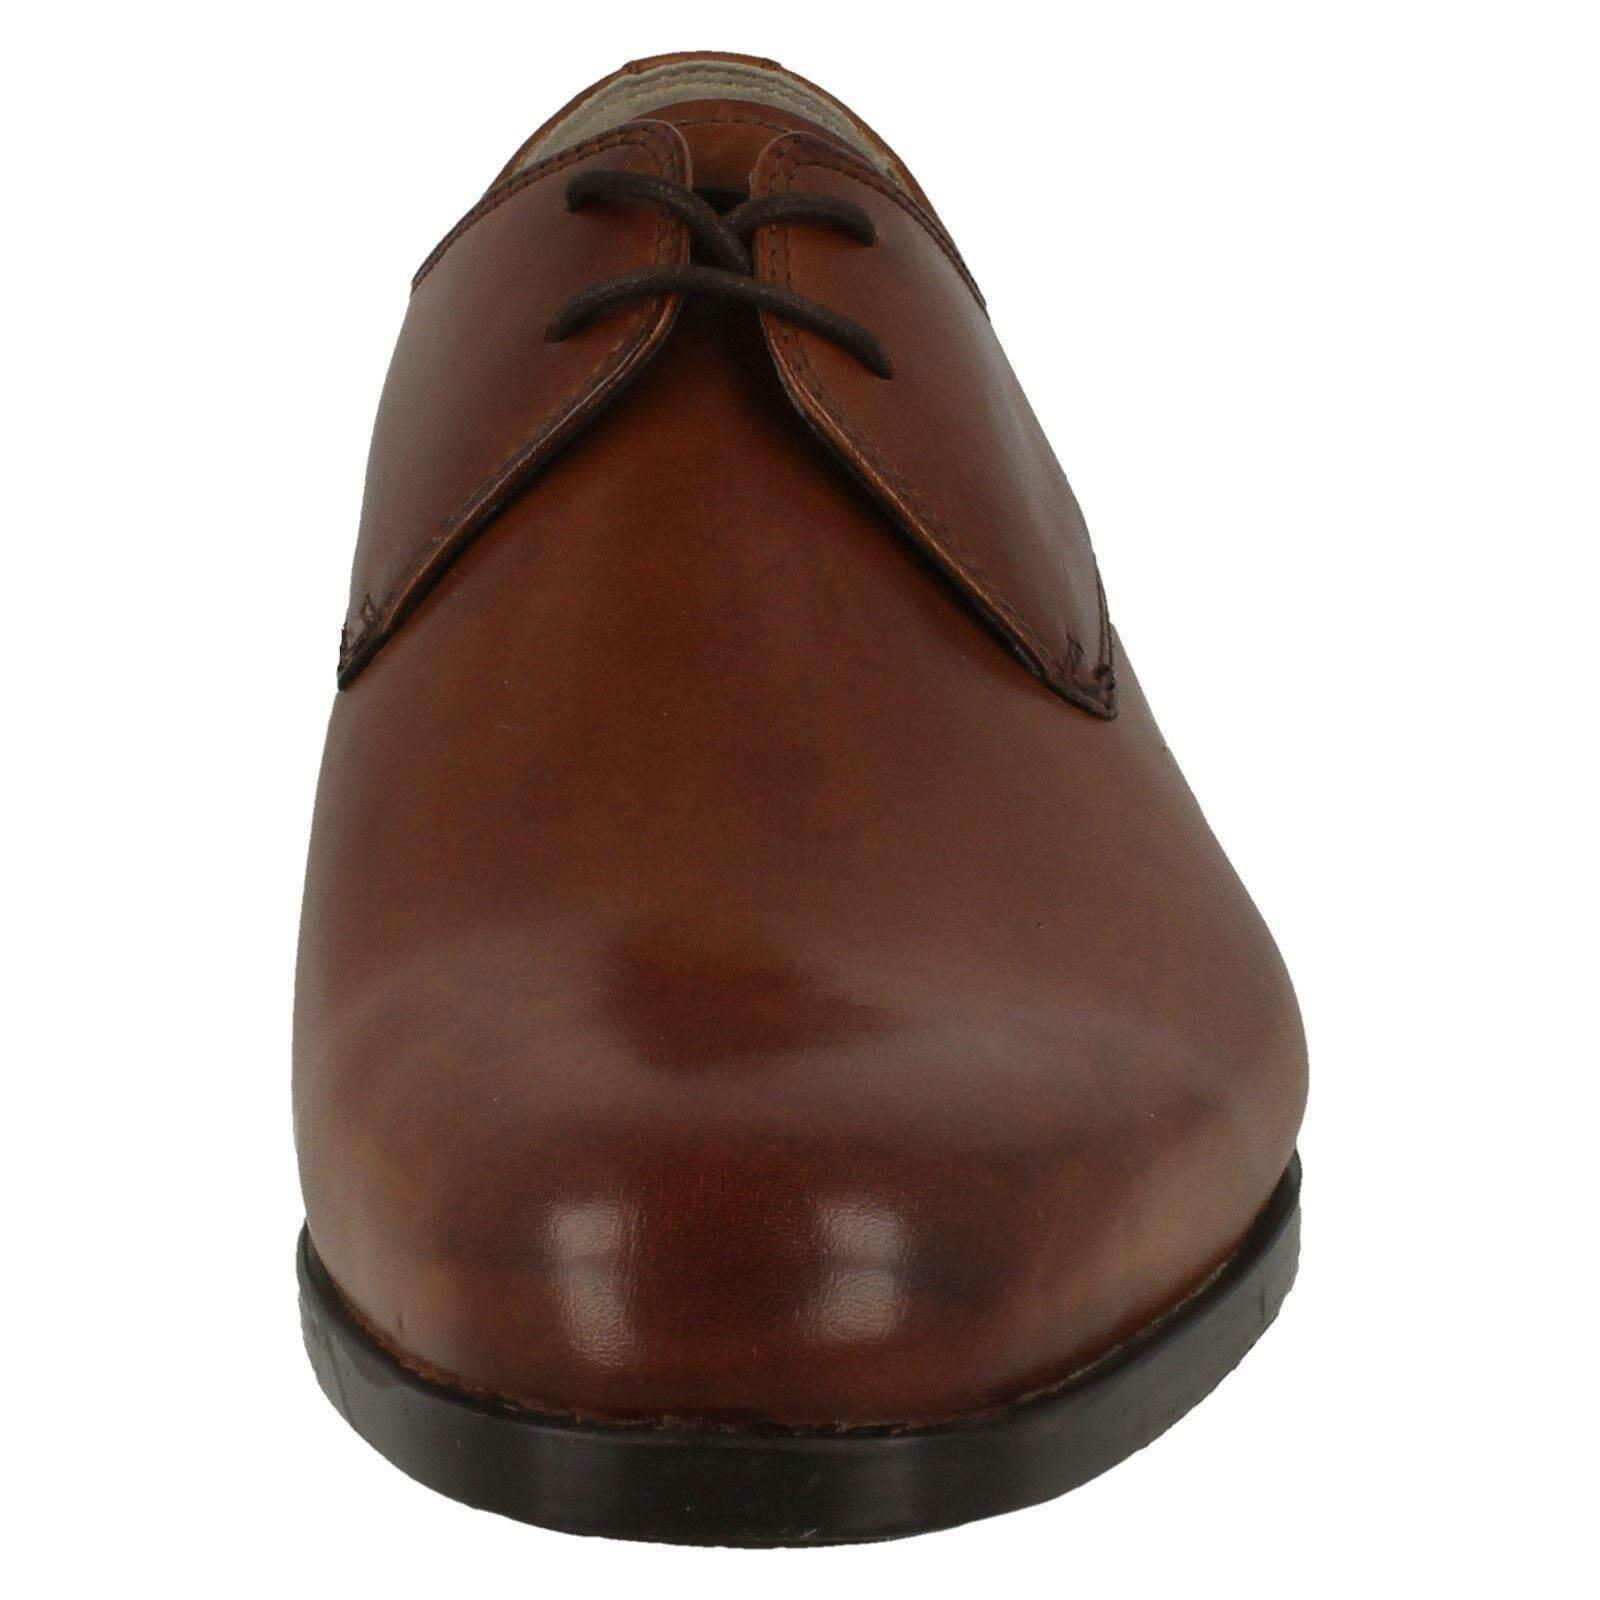 Clarks Amieson Lace Walk  Uomo Leder Lace Amieson Up Schuhe 72c2fe